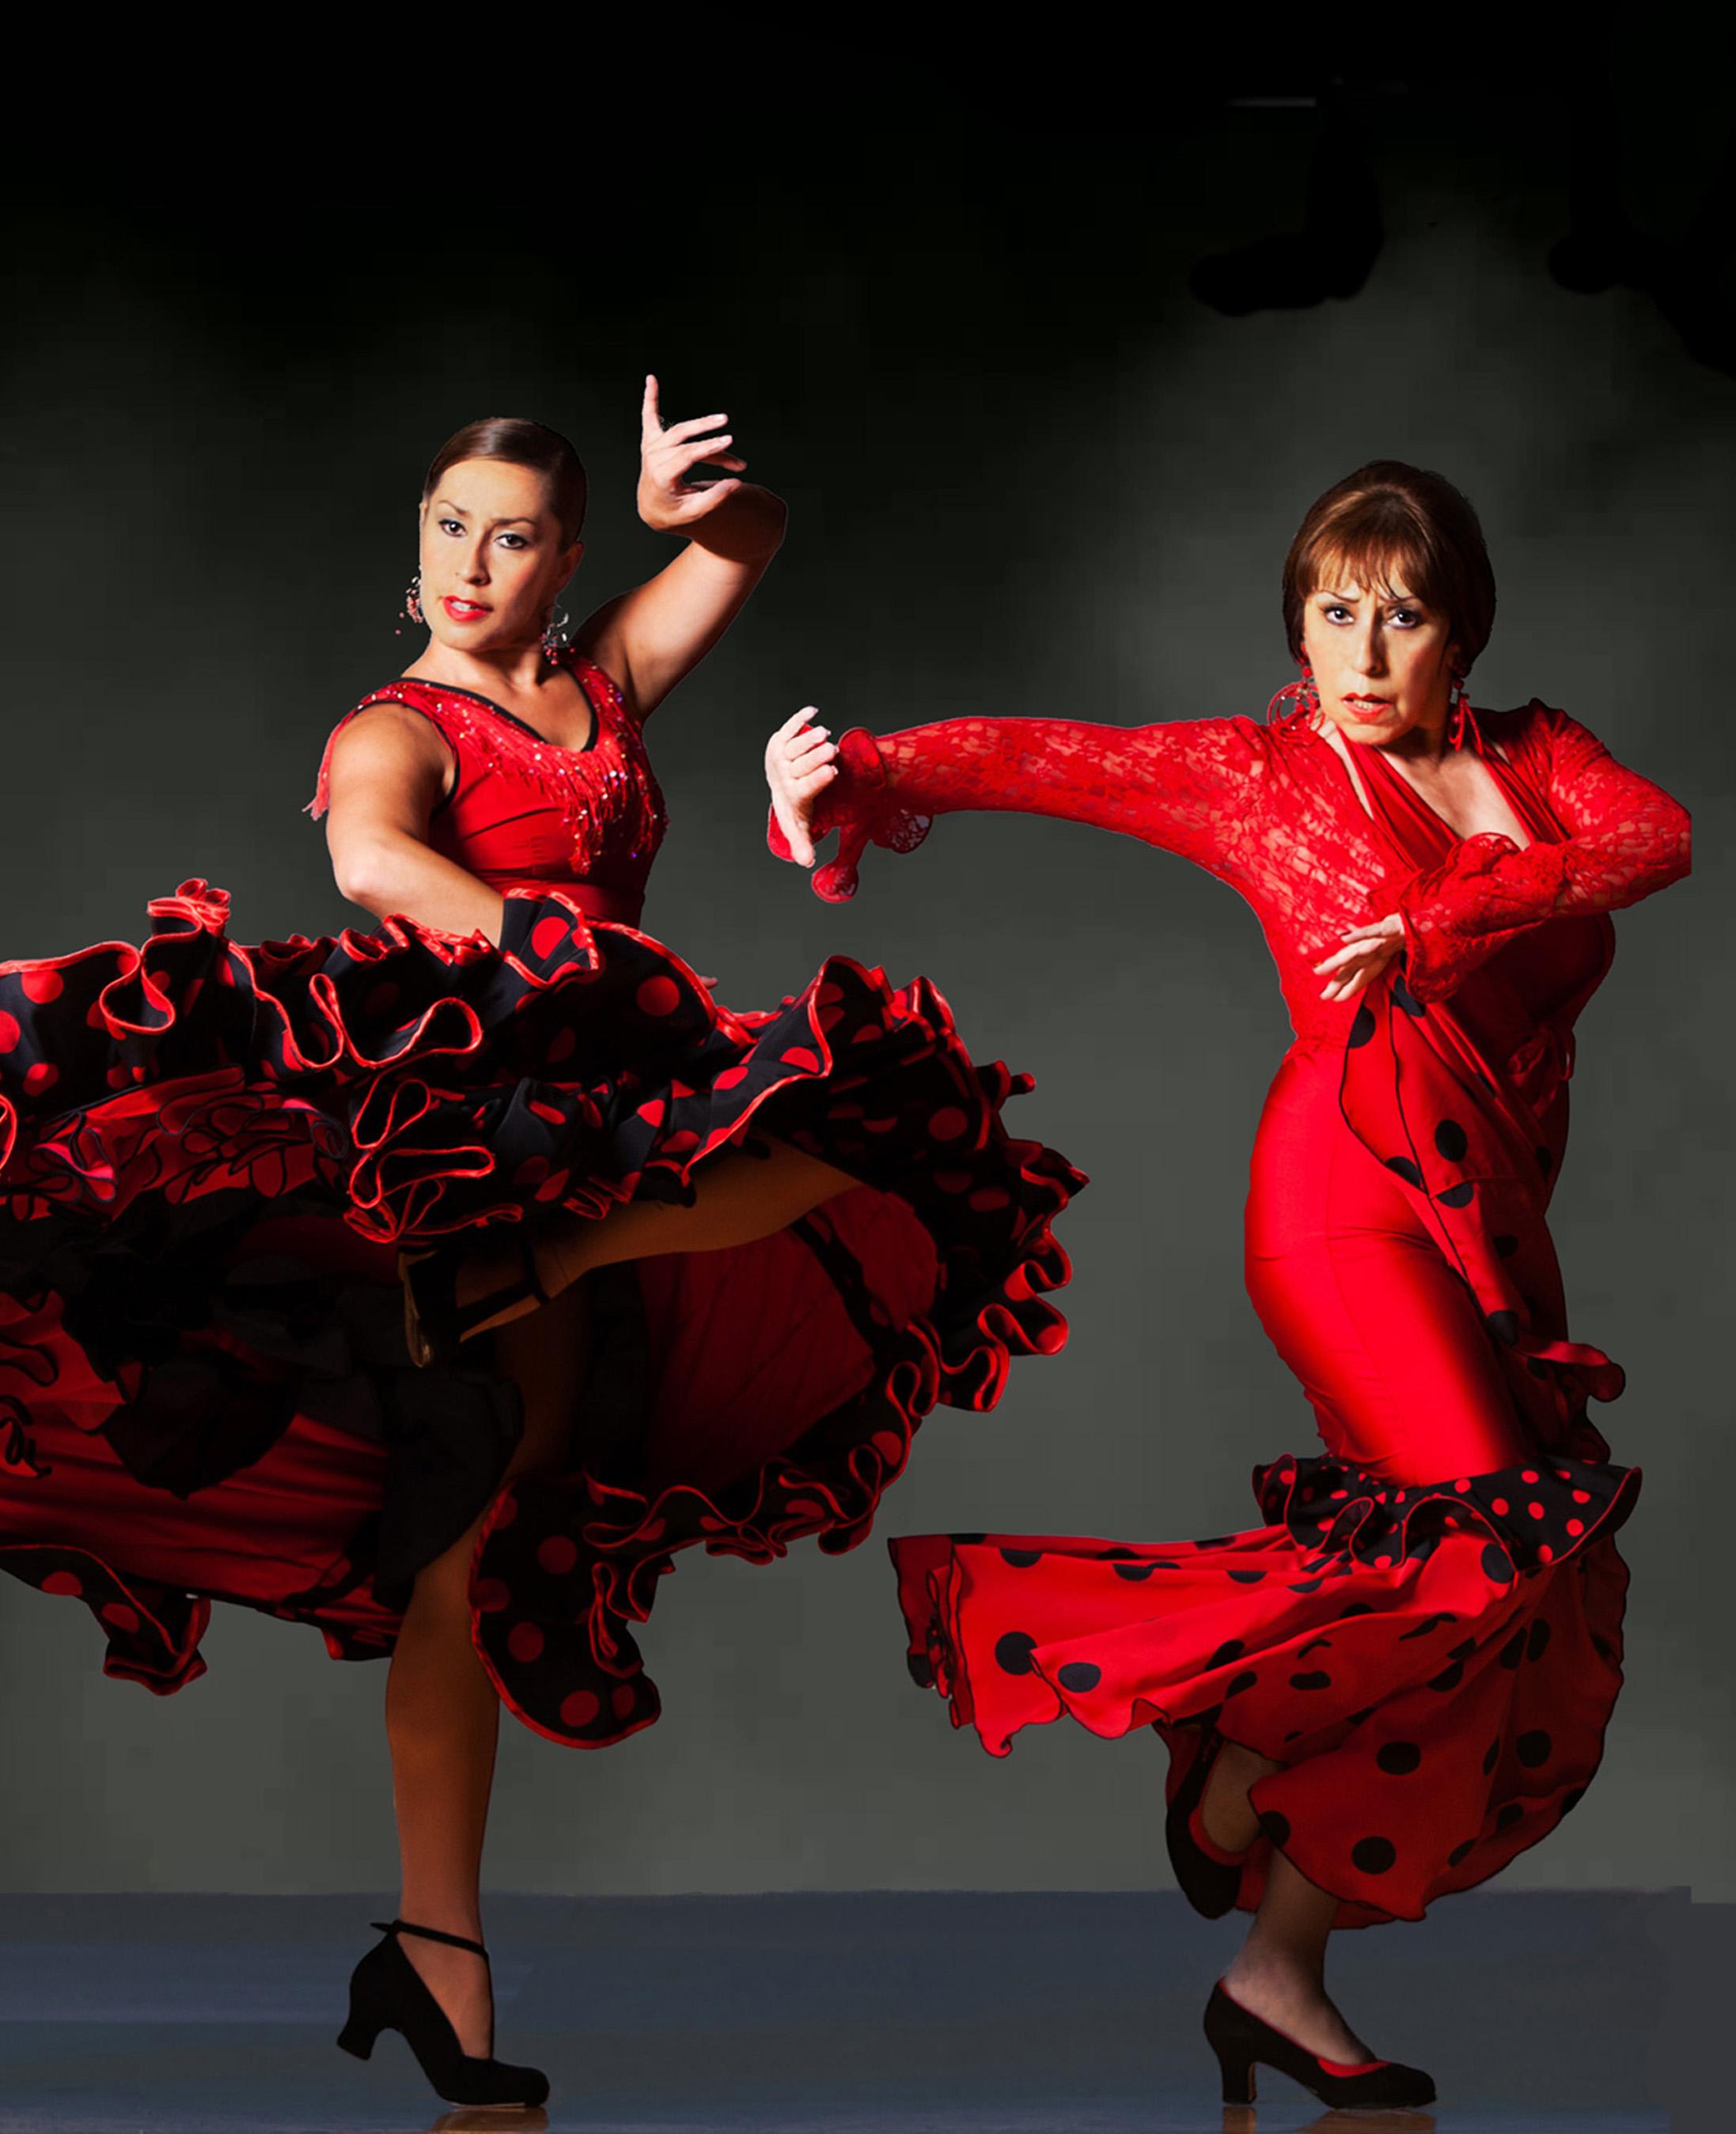 carolina lugo 39 s carol acu a 39 s ballet flamenco concord ca on sat sep 20 2014 at cue. Black Bedroom Furniture Sets. Home Design Ideas